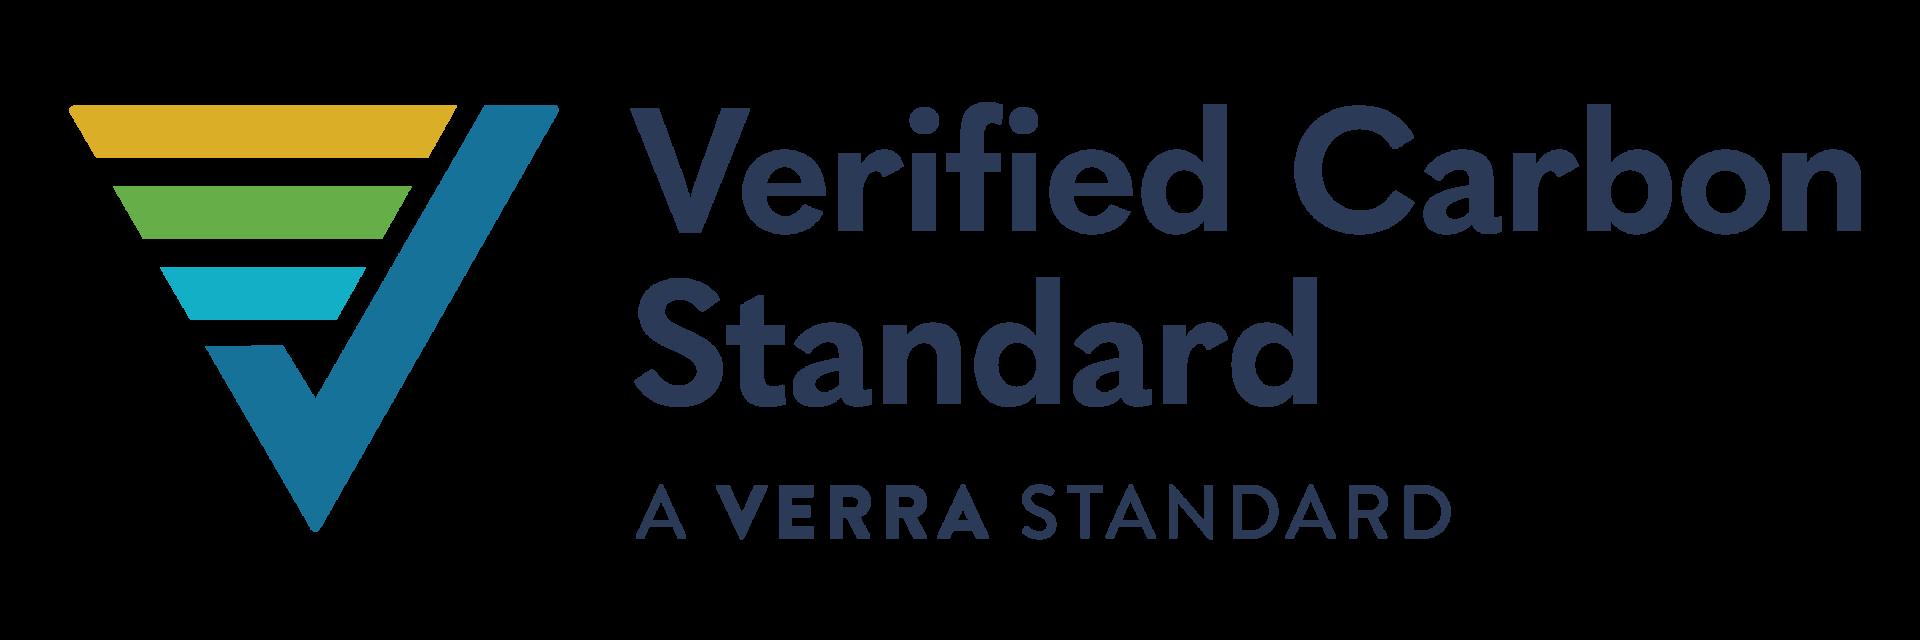 Verified Carbon Standard